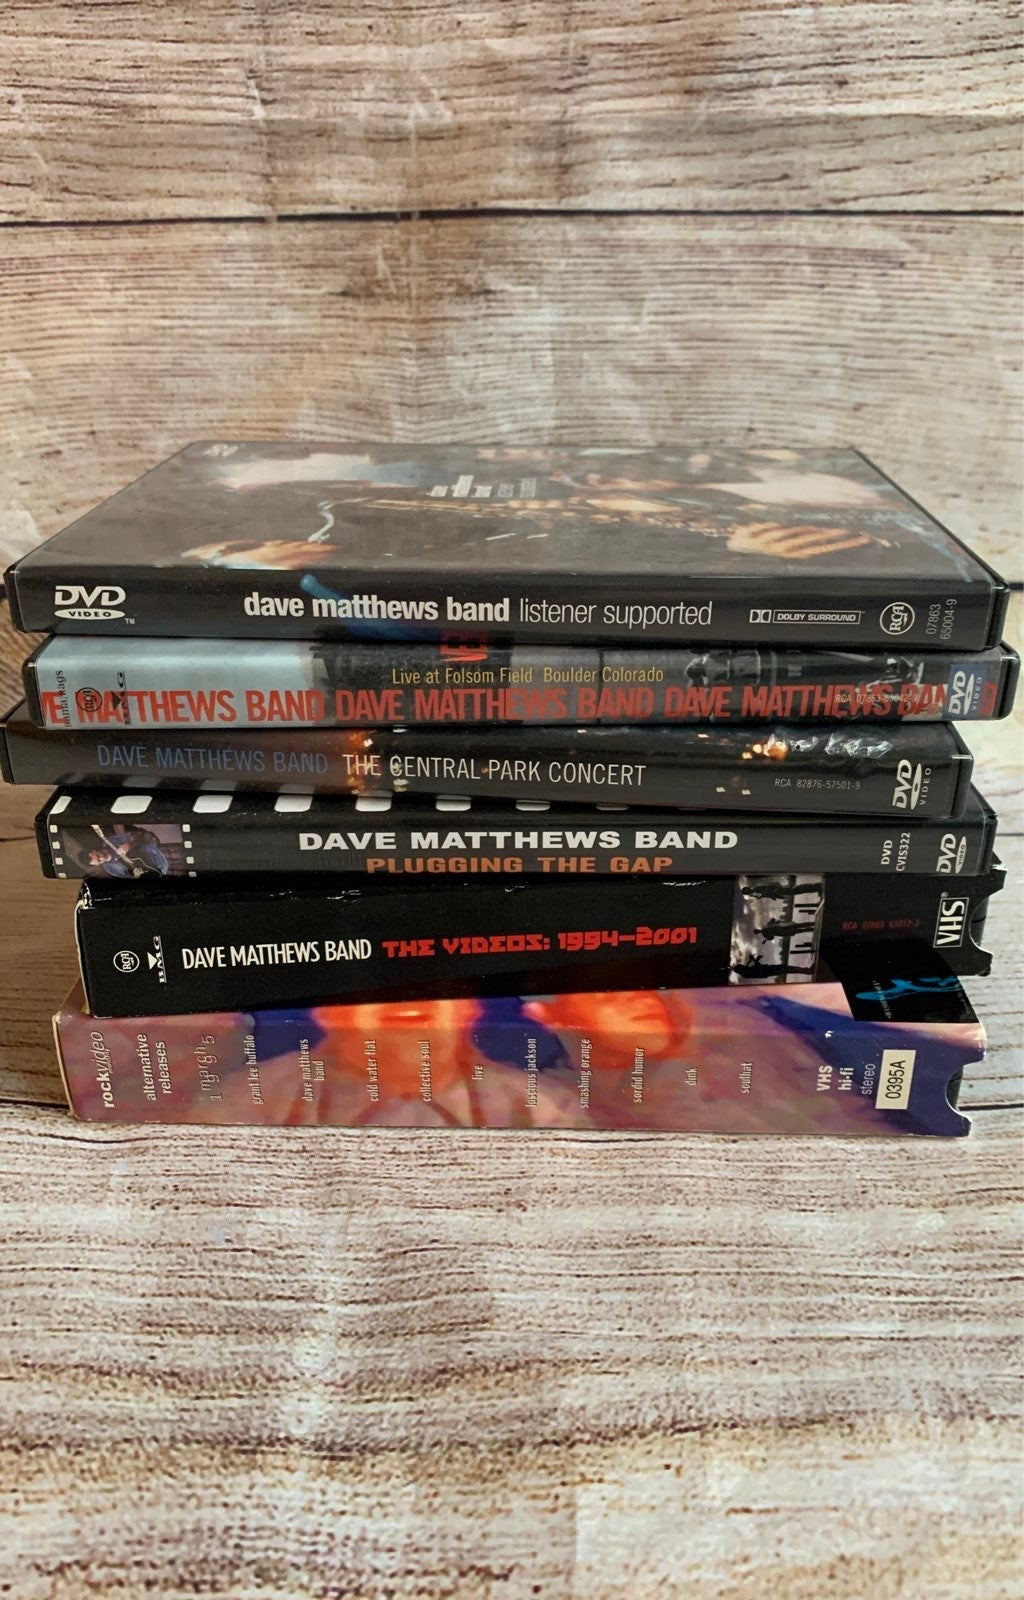 Dave Matthews Band DVD/VHS Bundle